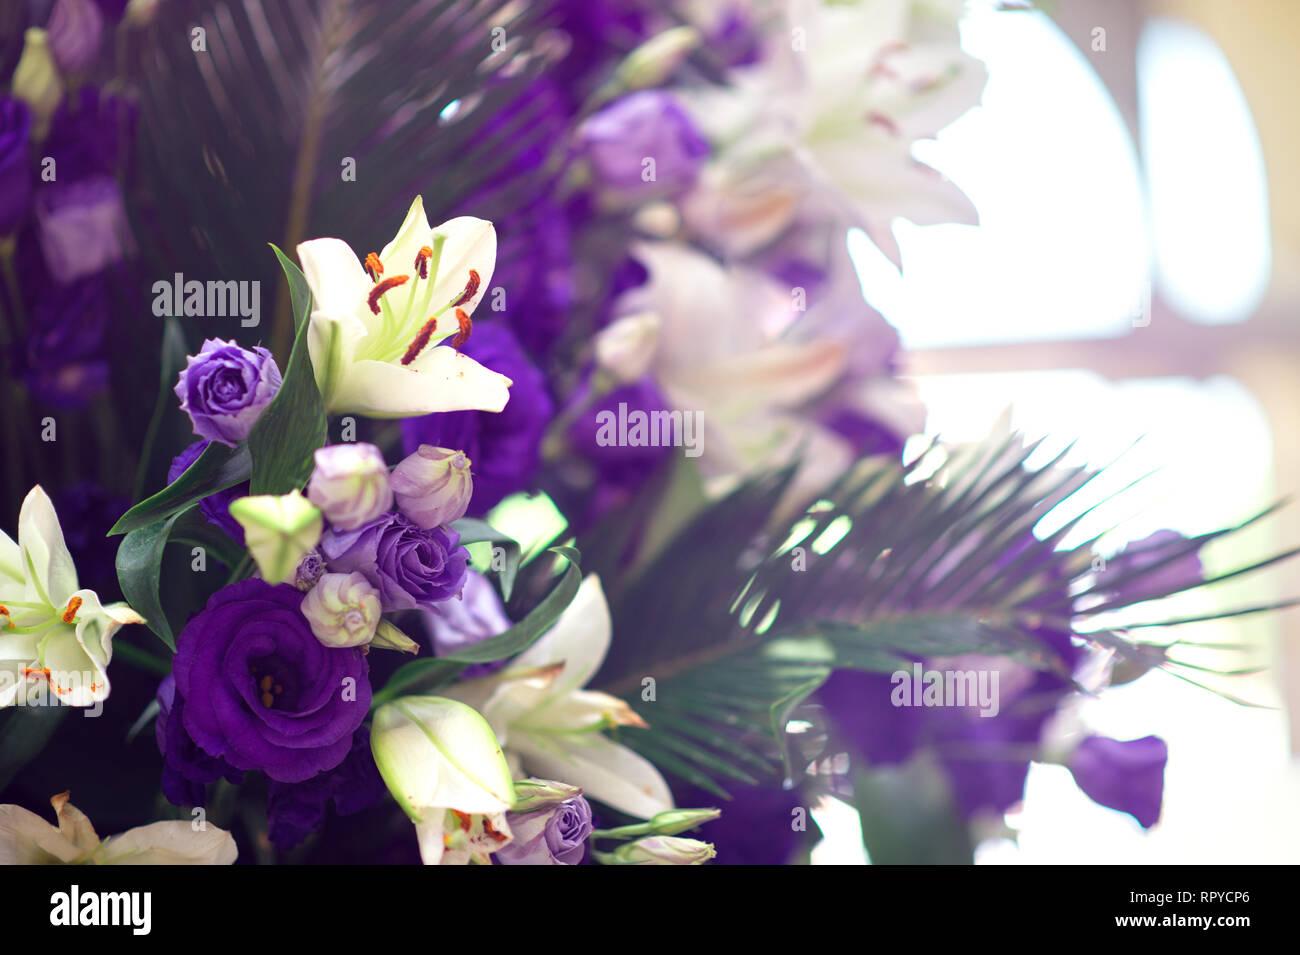 Beautiful violet eustoma bouqet - Stock Image